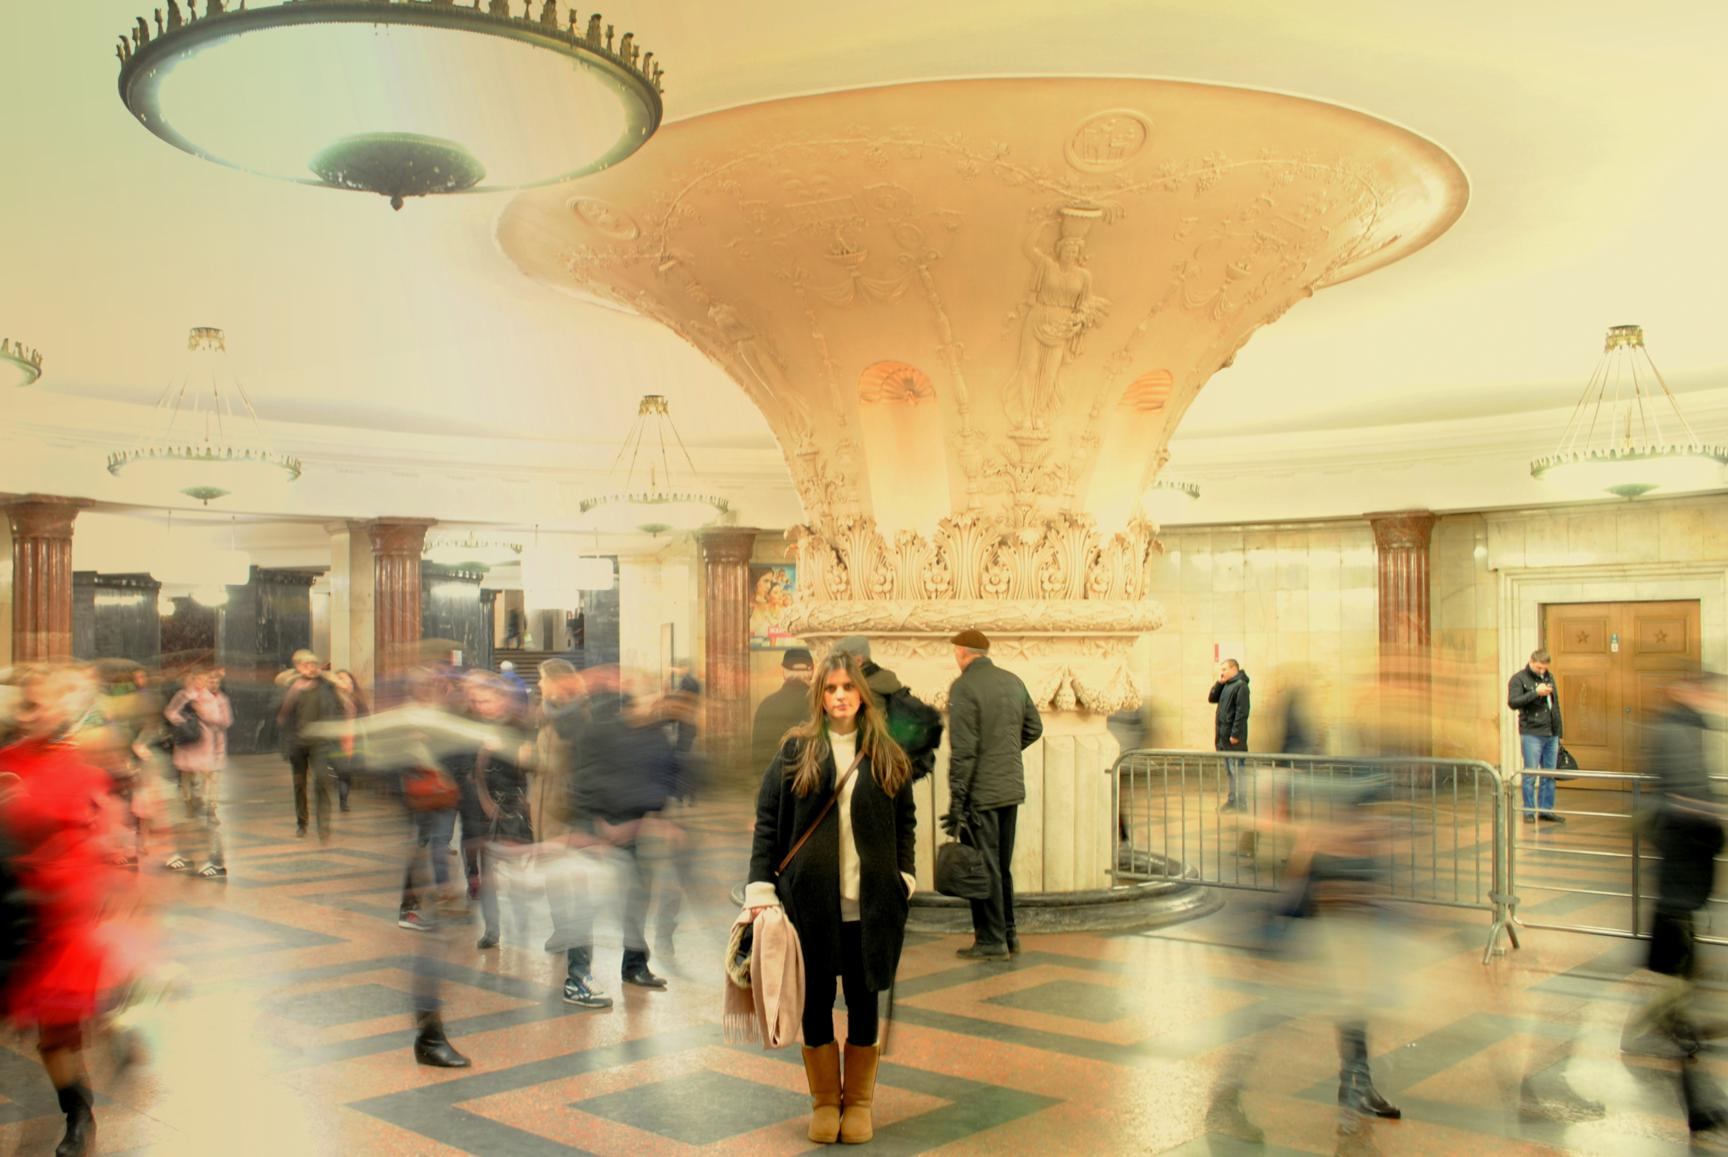 metro-moscu-komsomolskaya